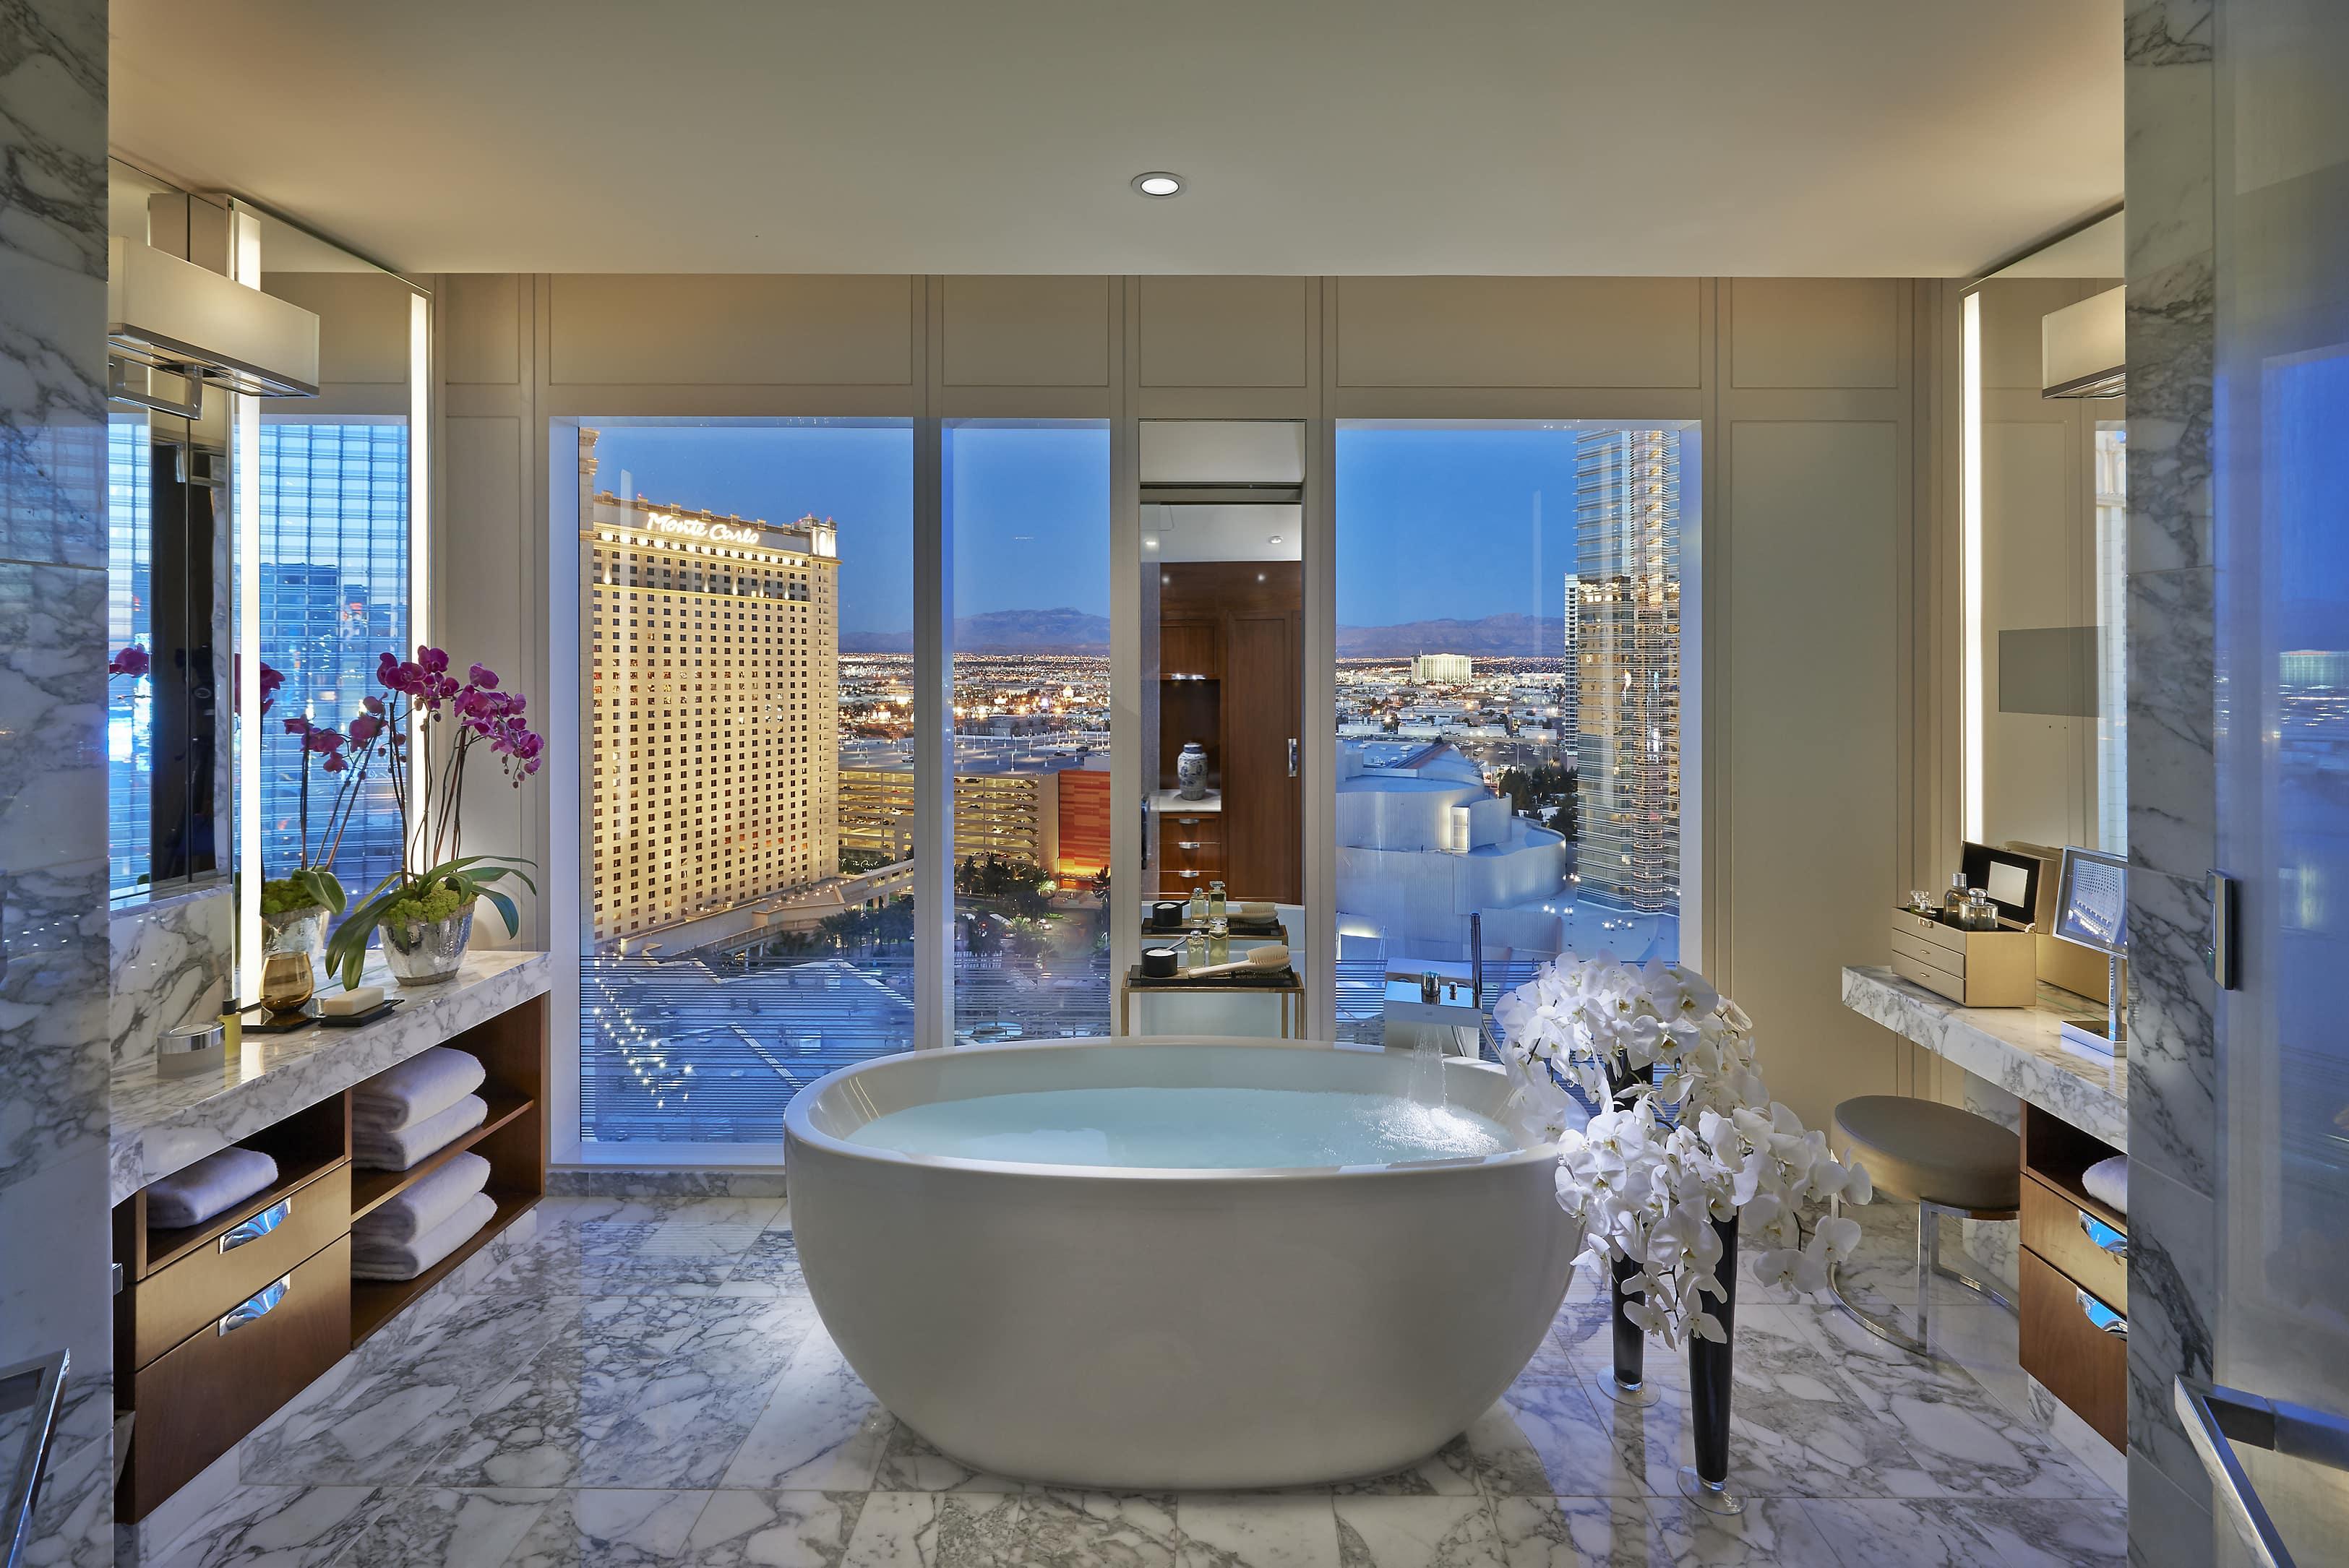 hotel photo gallery | mandarin oriental, las vegas